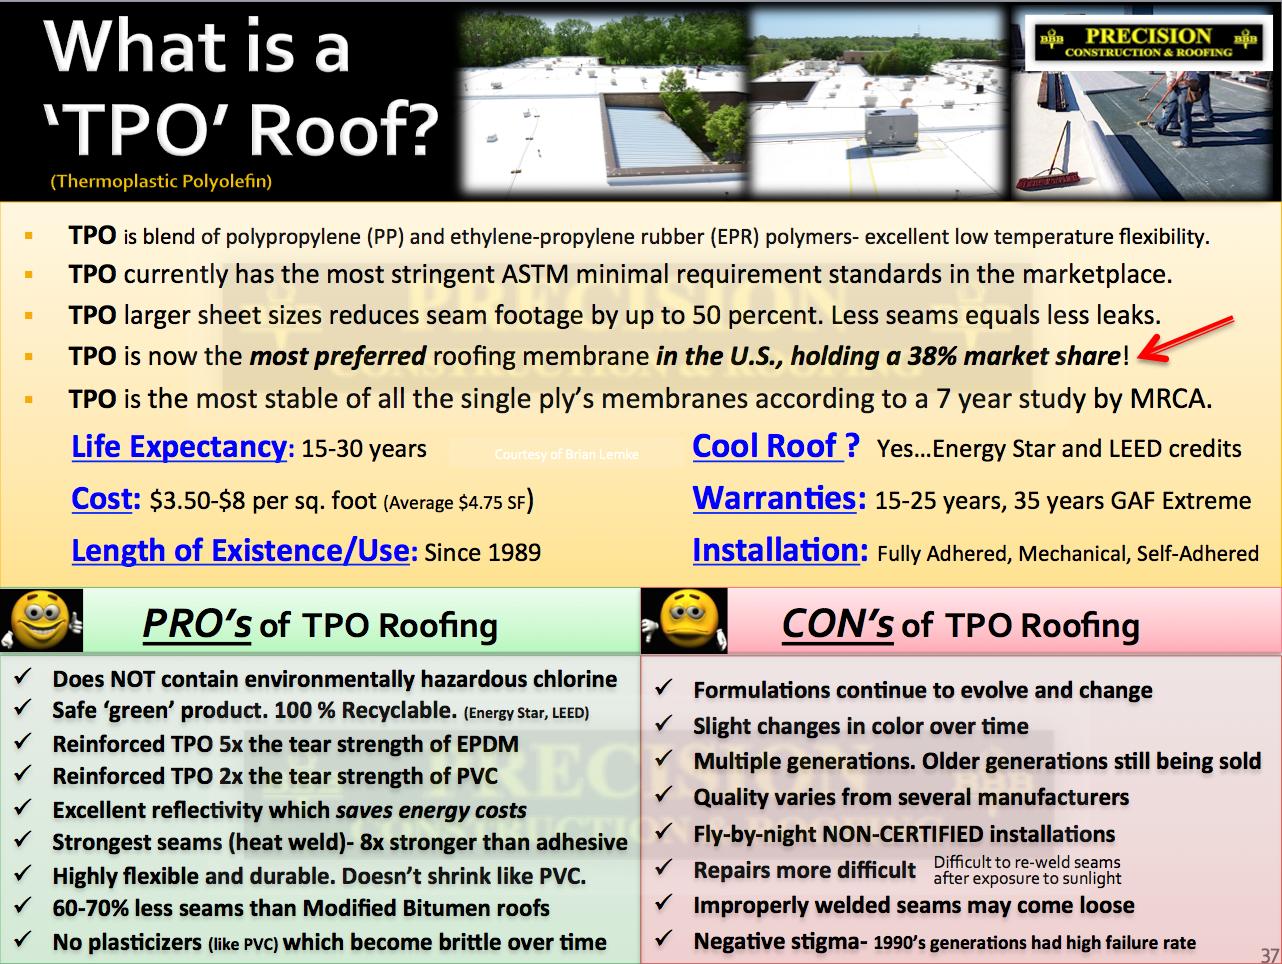 Commercial Roof TPO Vs  PVC Vs  Modified Bitumen - Roofing